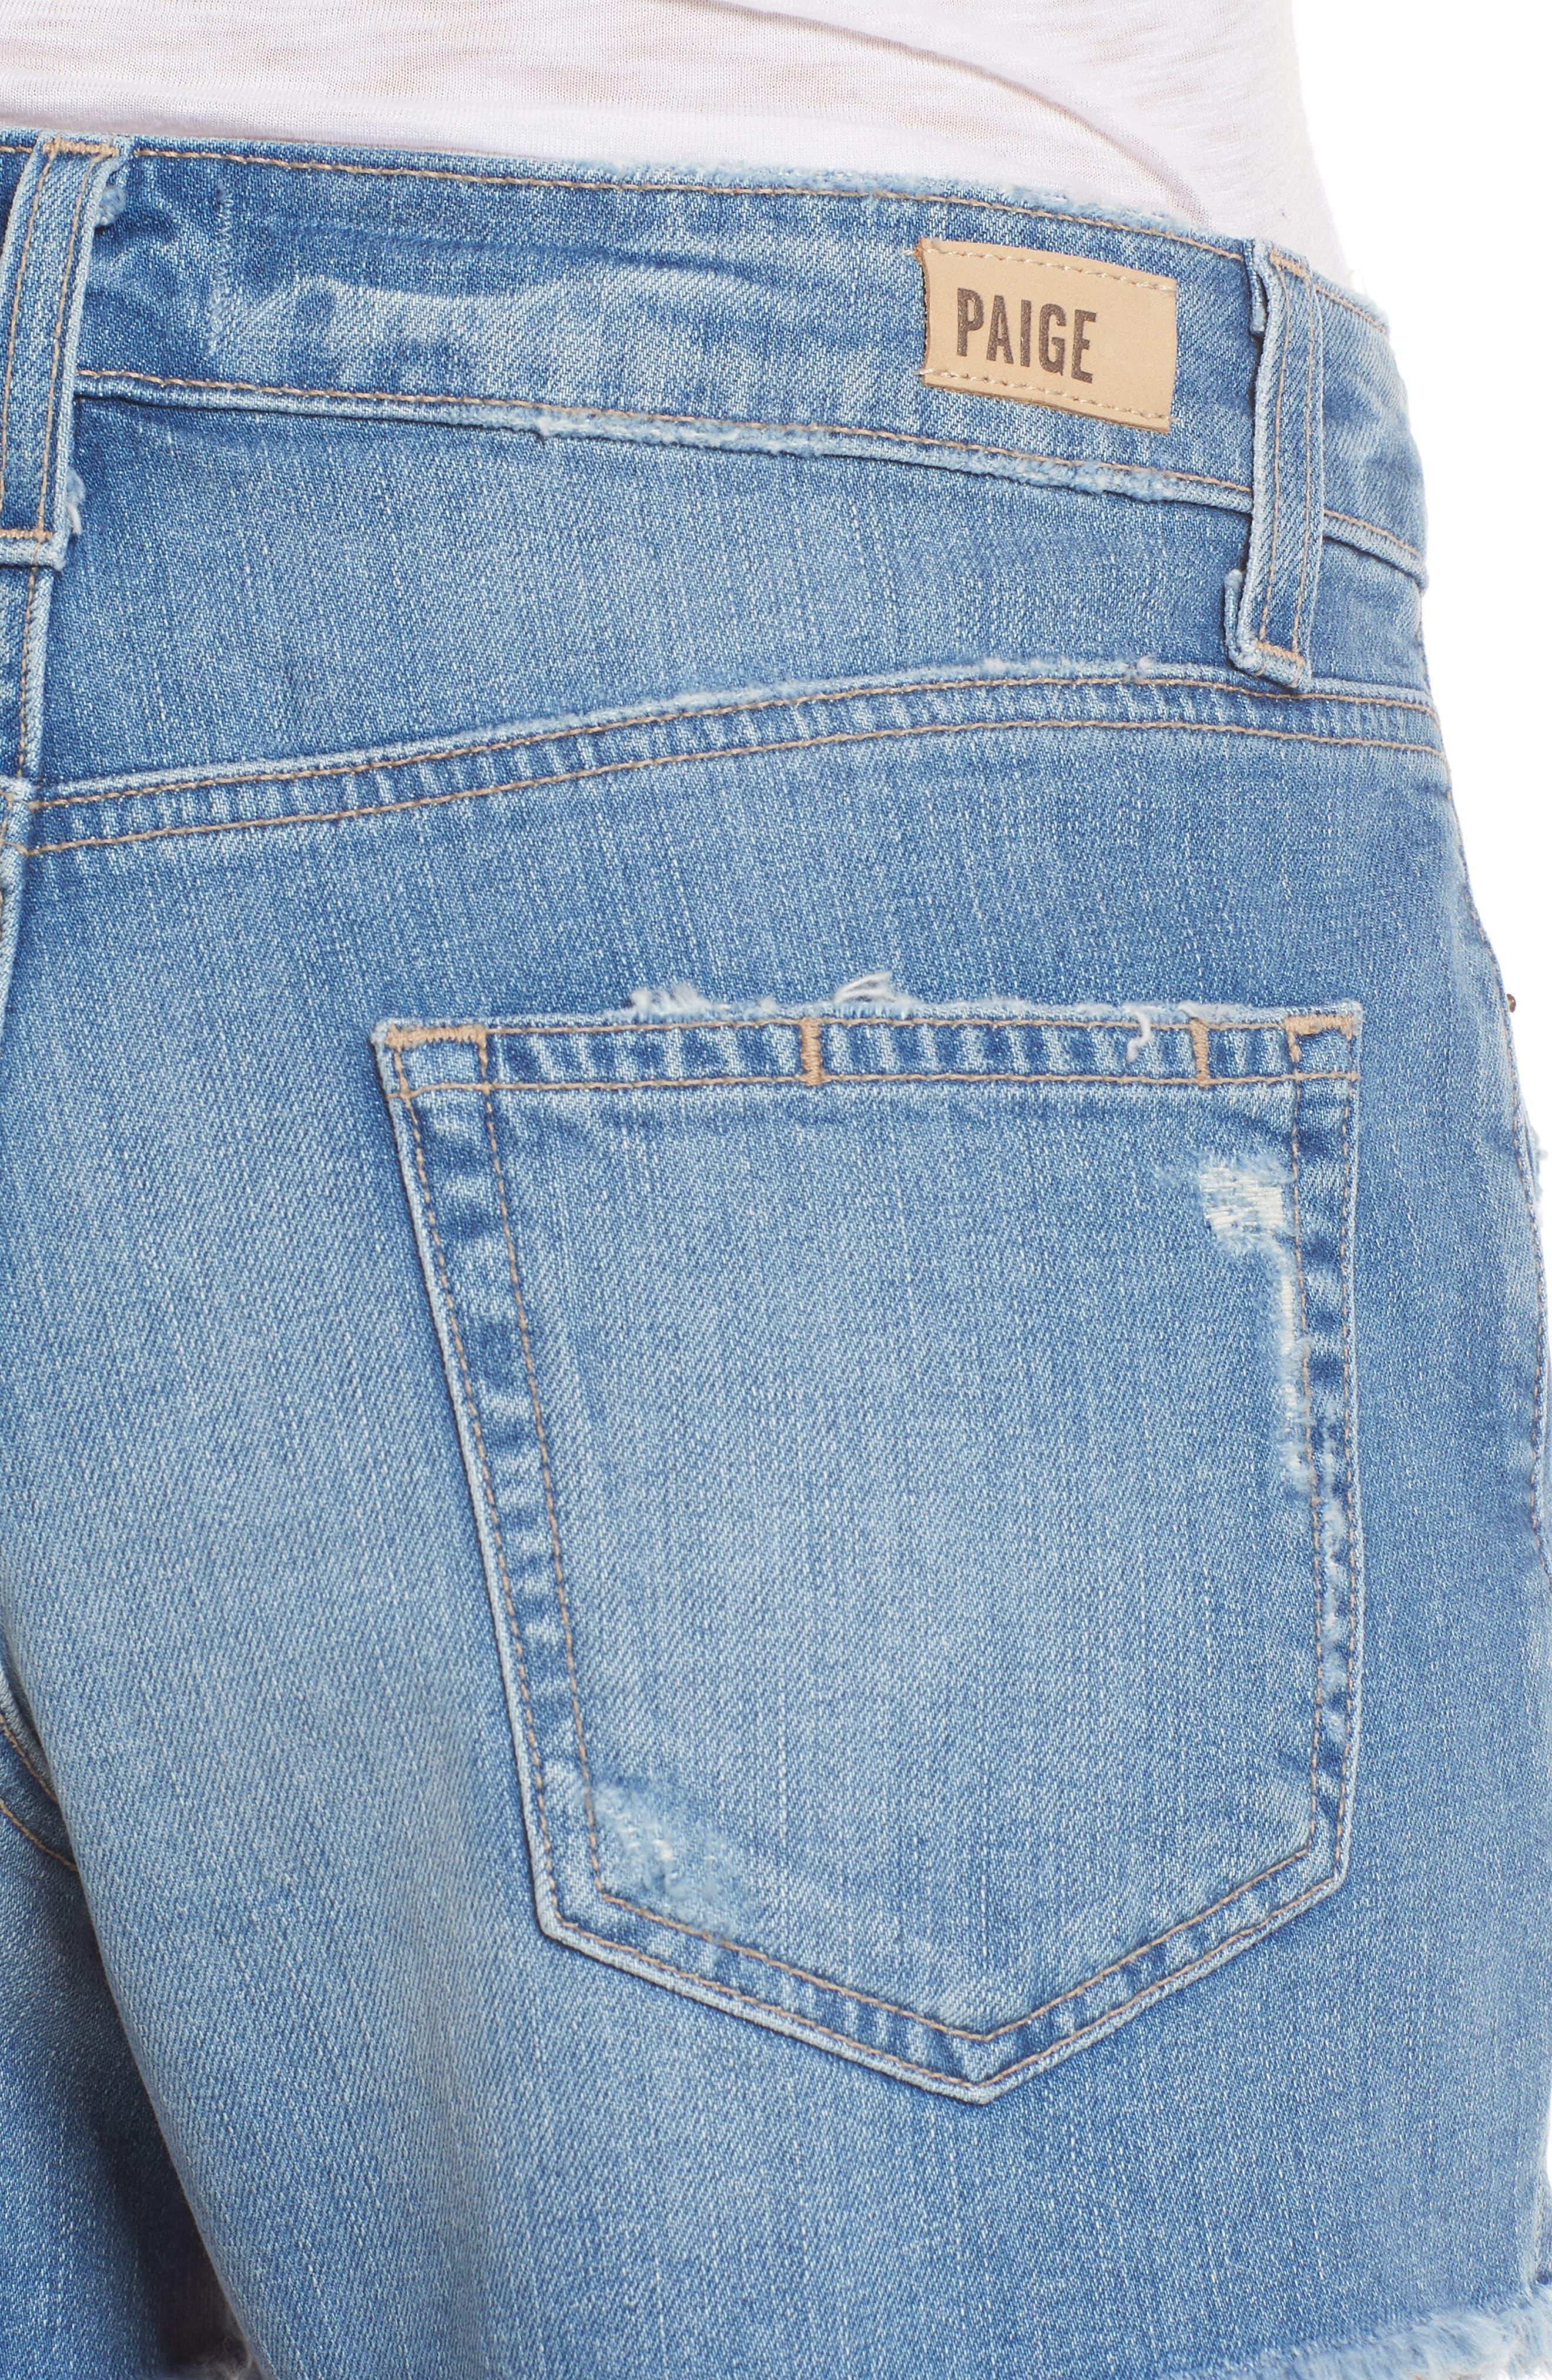 Emmitt High Waist Cutoff Denim Shorts,                             Alternate thumbnail 4, color,                             Janis Destructed